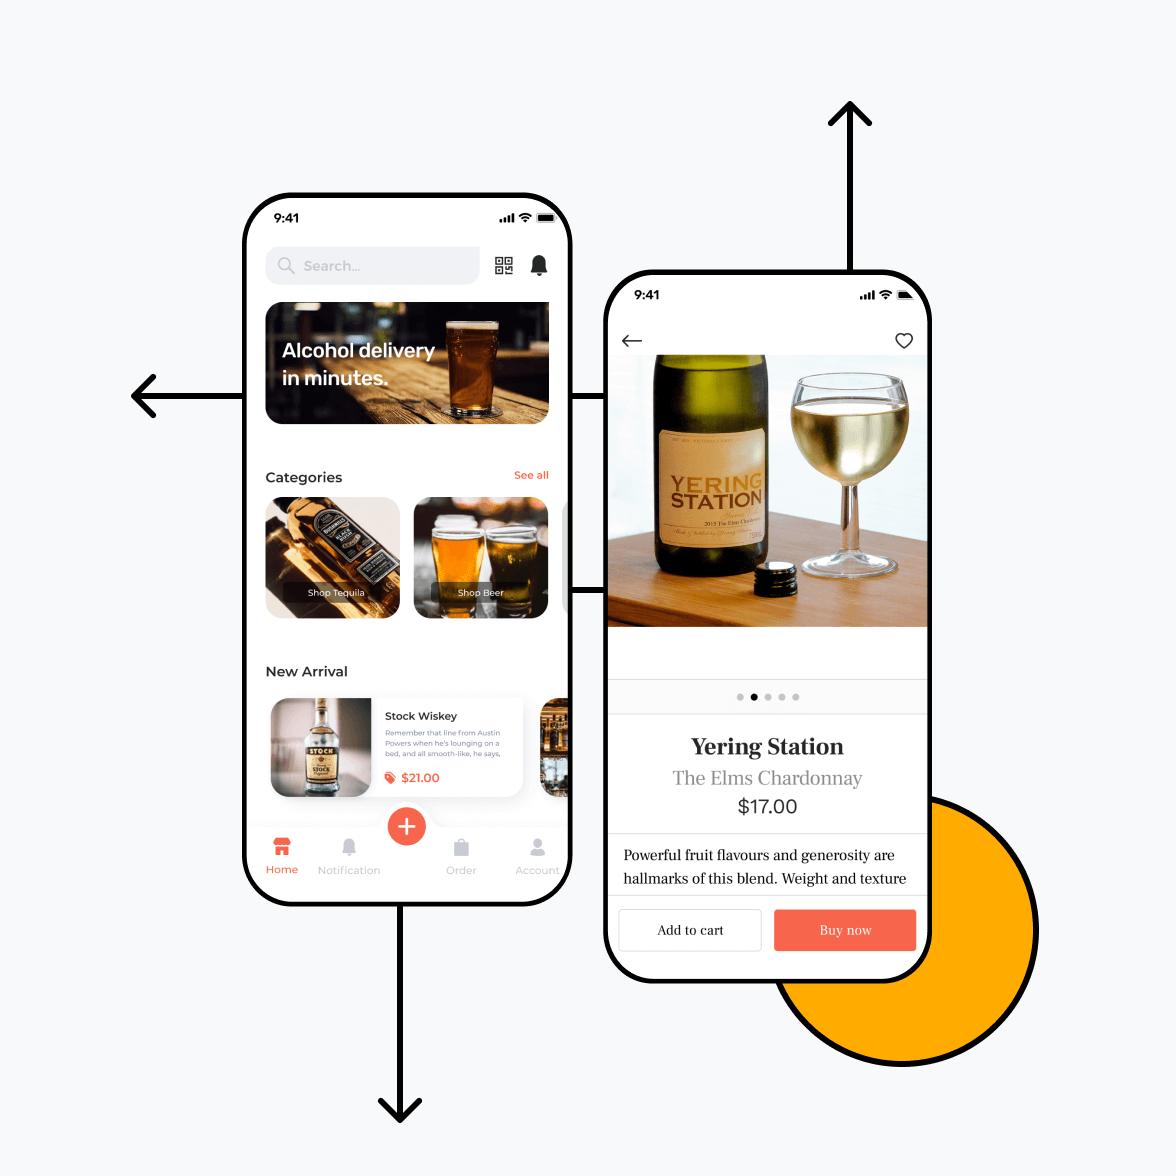 Liquor delivery app screens product details